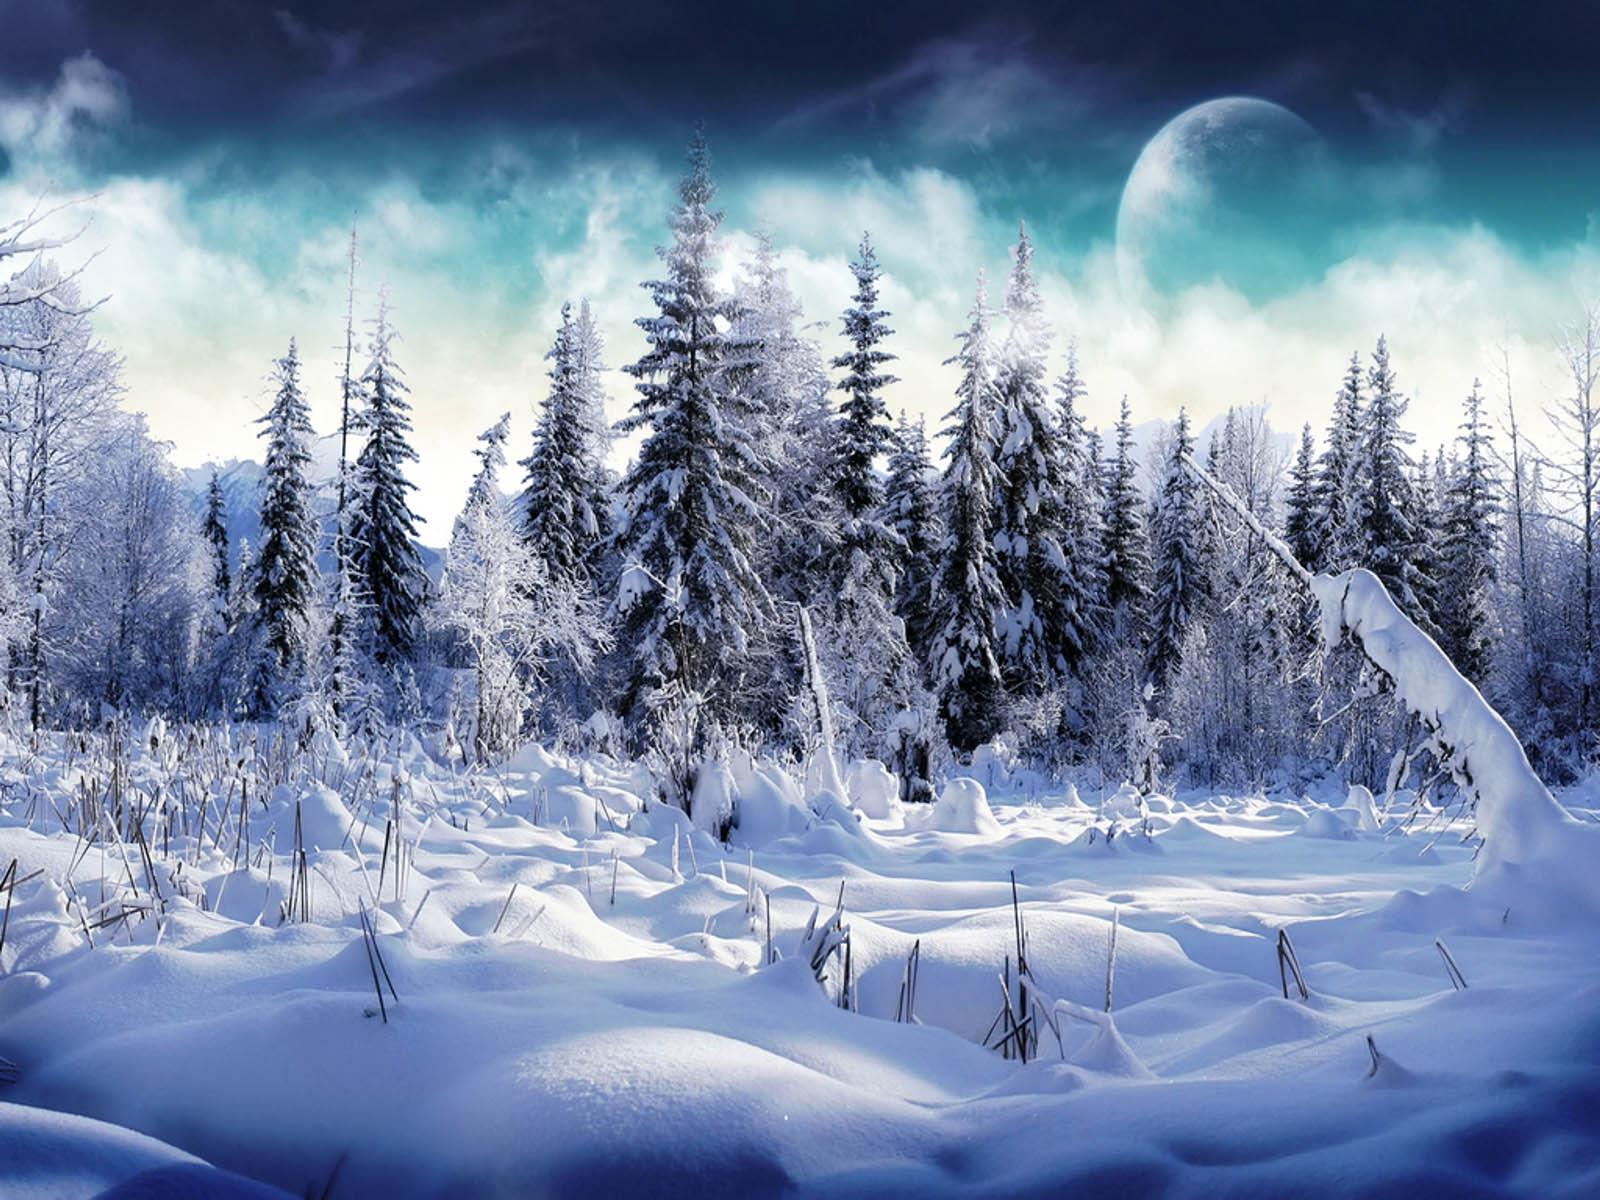 wallpaper: Snow Desktop Wallpapers and Backgrounds